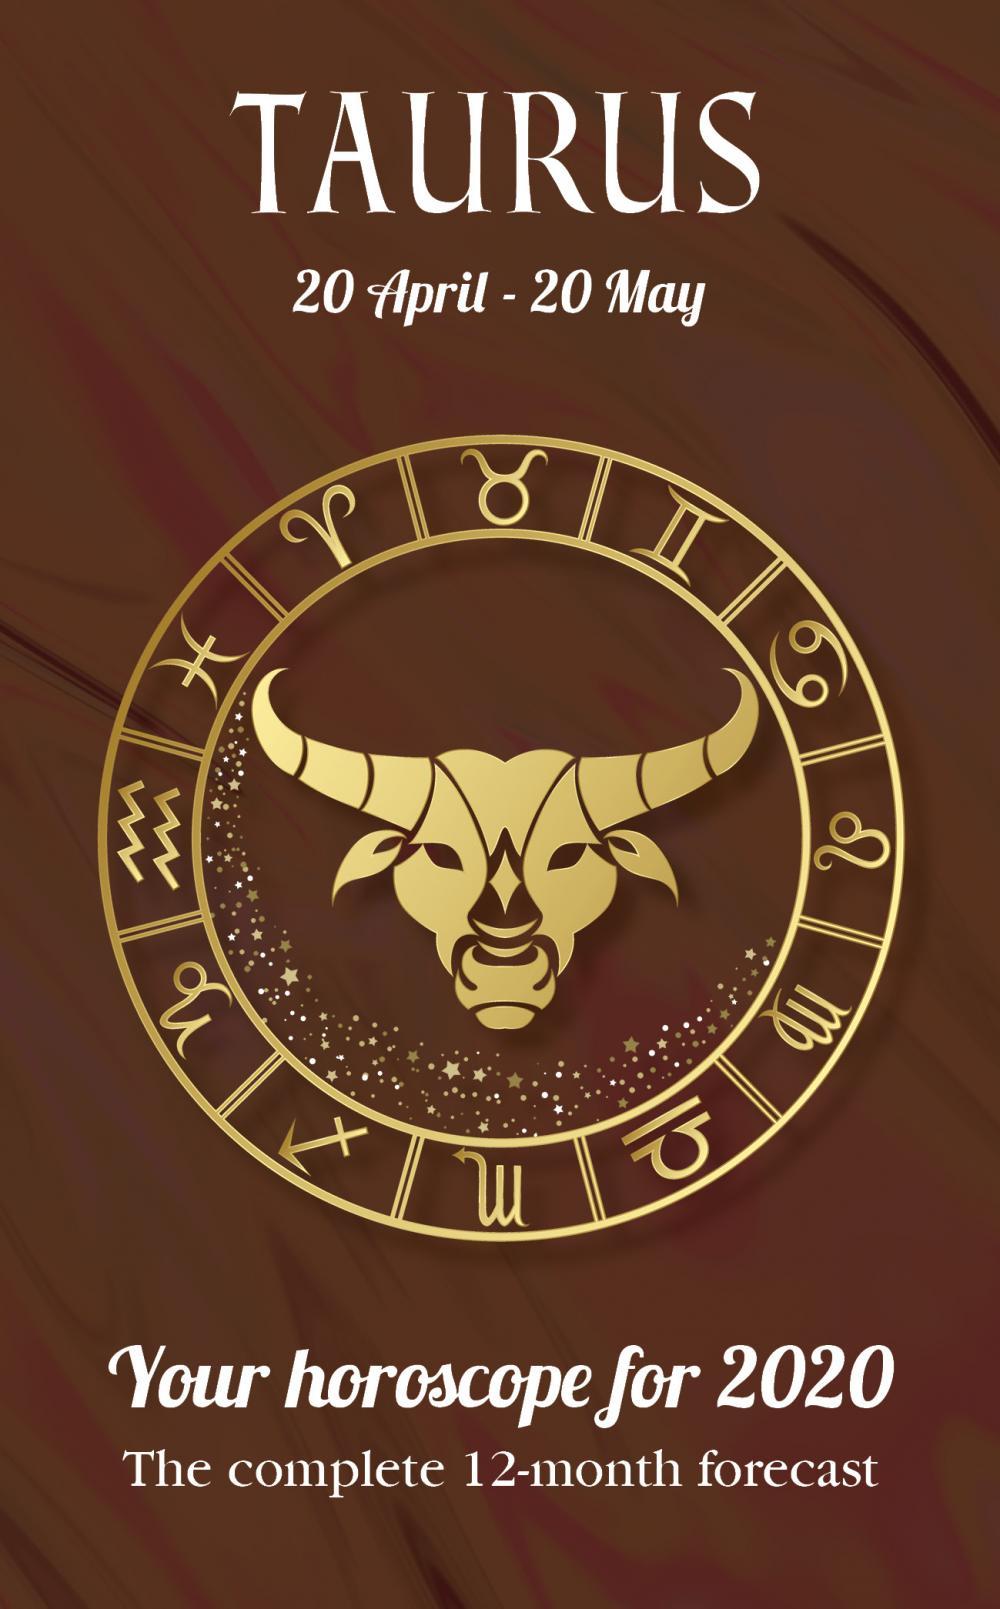 Your Horoscope for 2020: Taurus